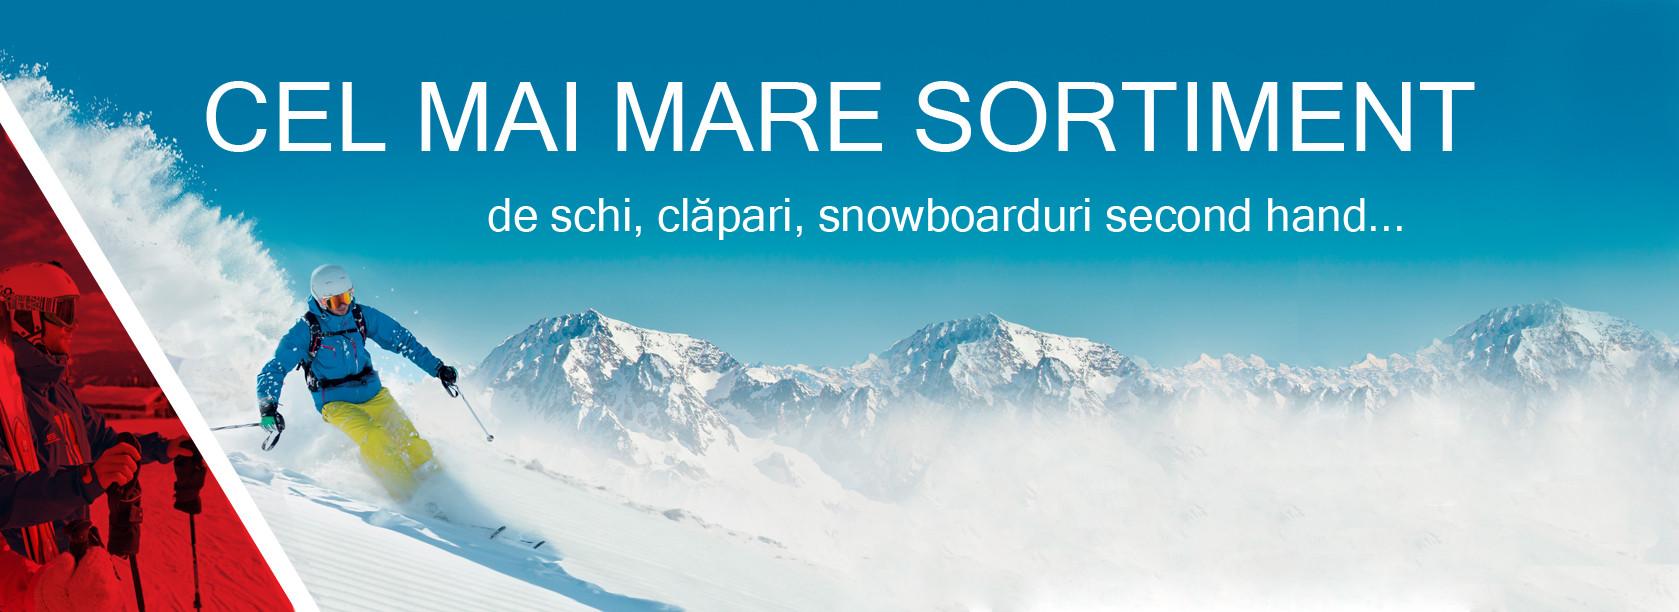 de schi, clapari, snowboarduri de mana a doua